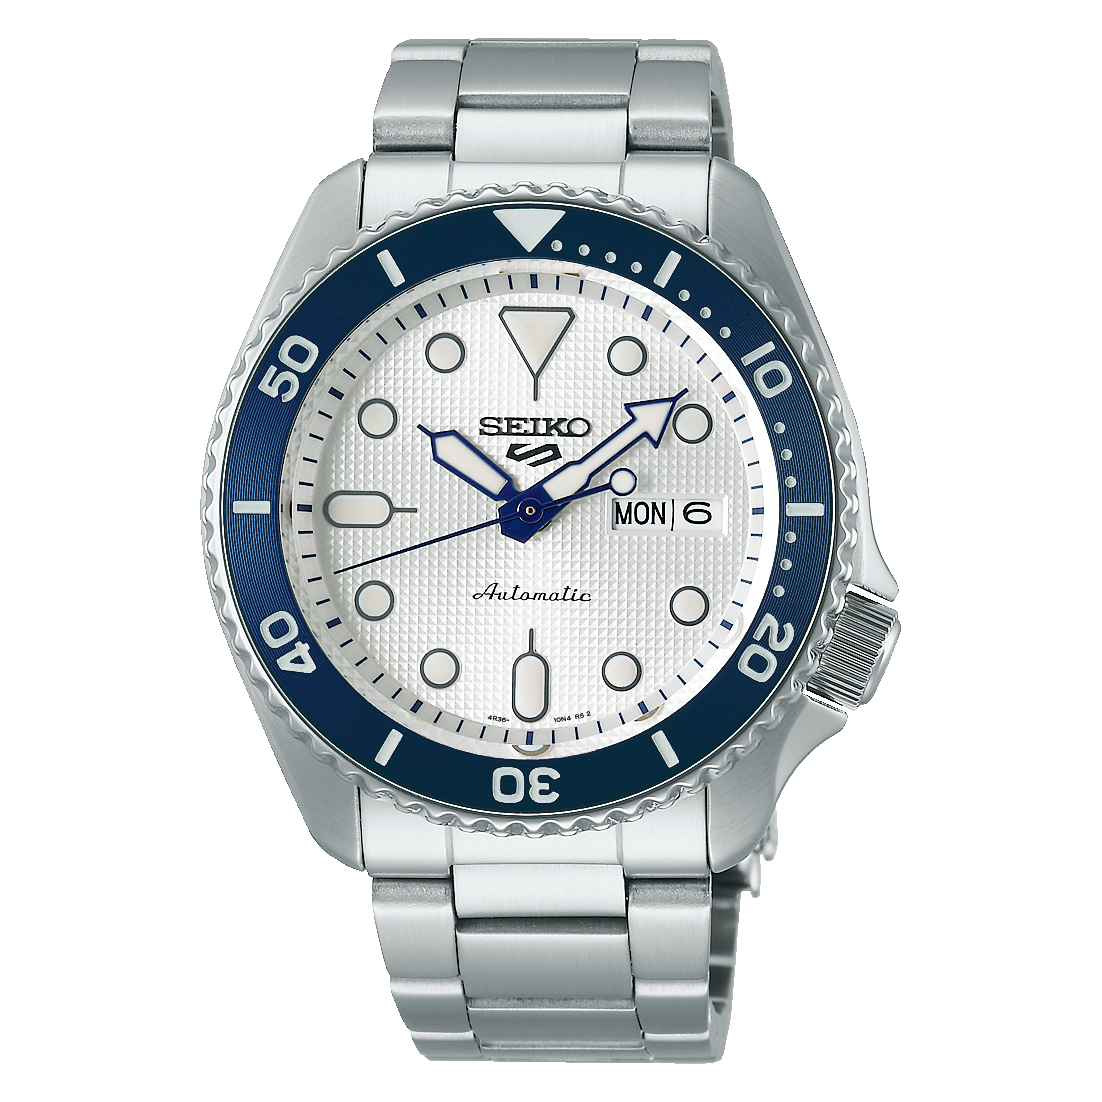 Orologio Seiko 5 SRPG47 K1